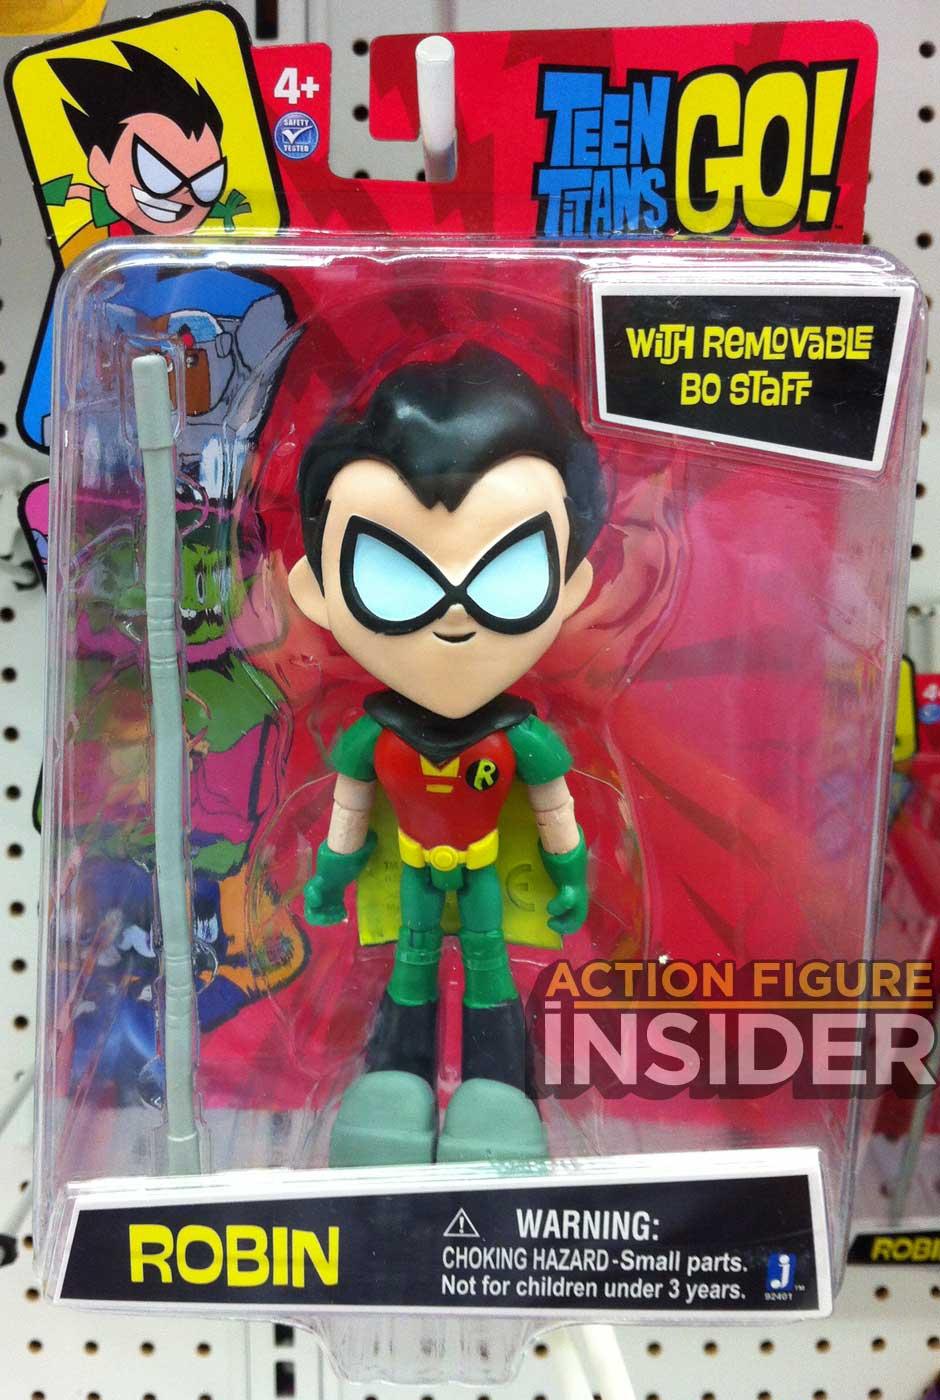 Teen Titans Toys Action Figures : Action figure insider jazwares 'teen titans go line